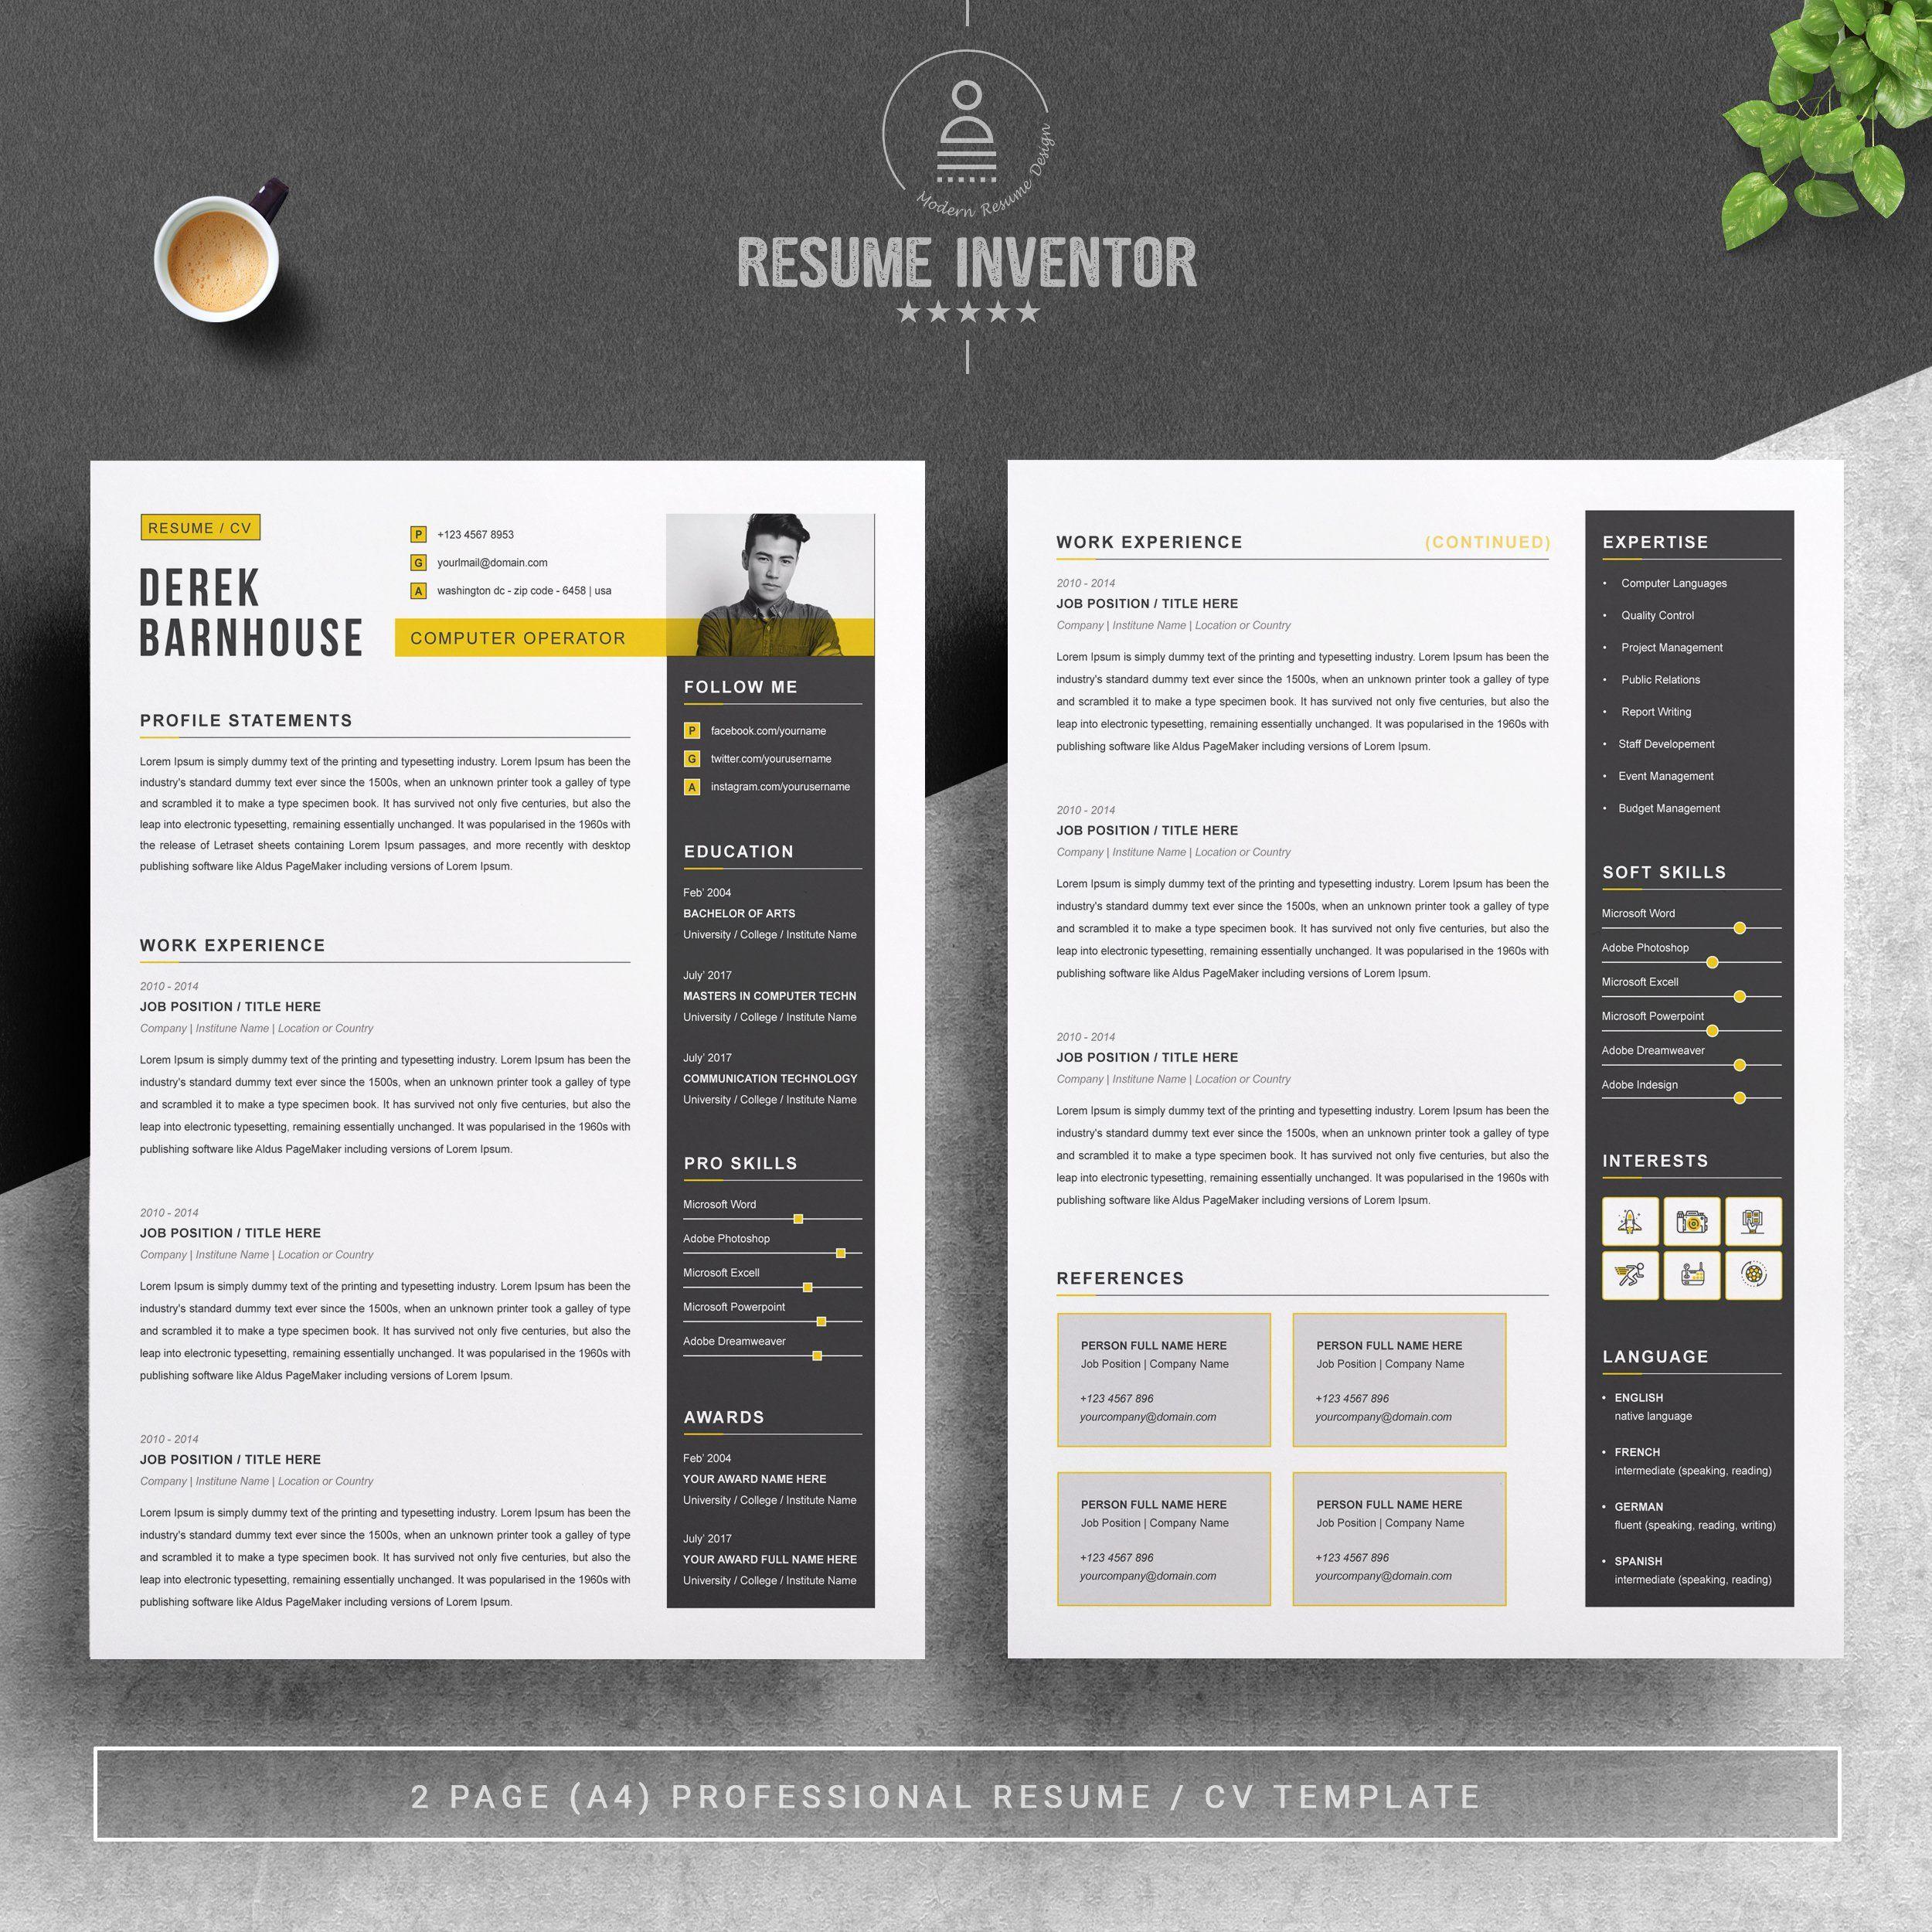 Cv Template Curriculum Vitae Cv Template Curriculum Vitae Resume Template